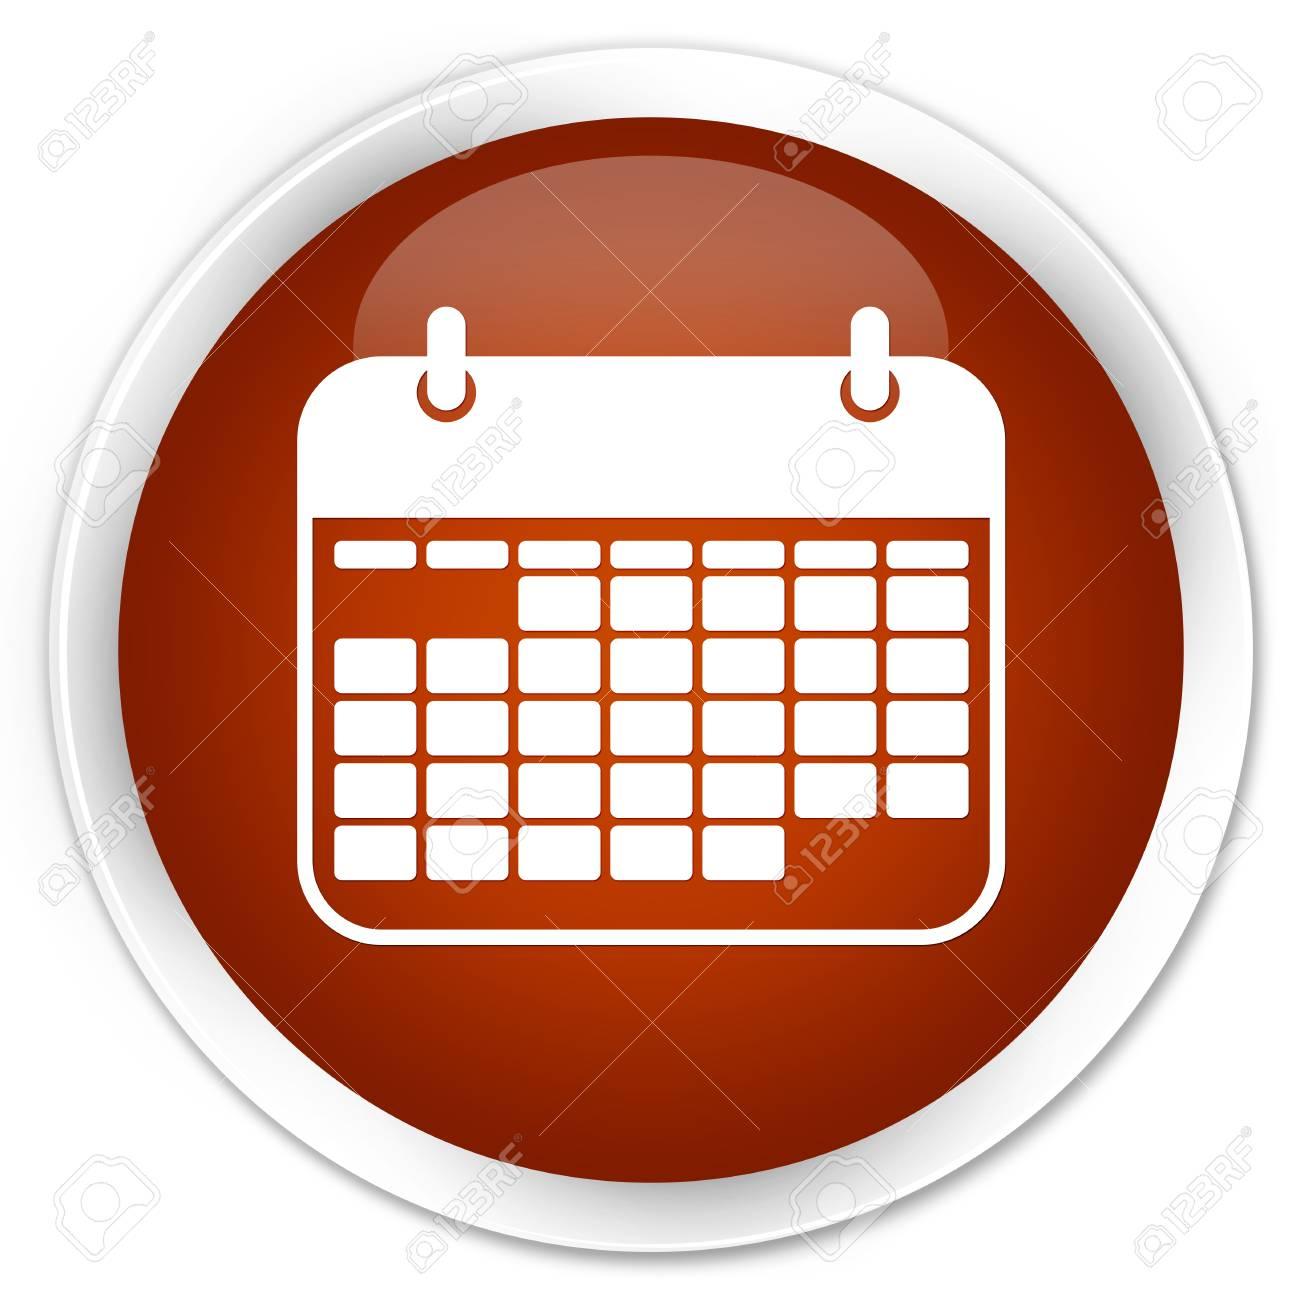 Calendar Icon Brown Glossy Round Button in Calendar Icon Round